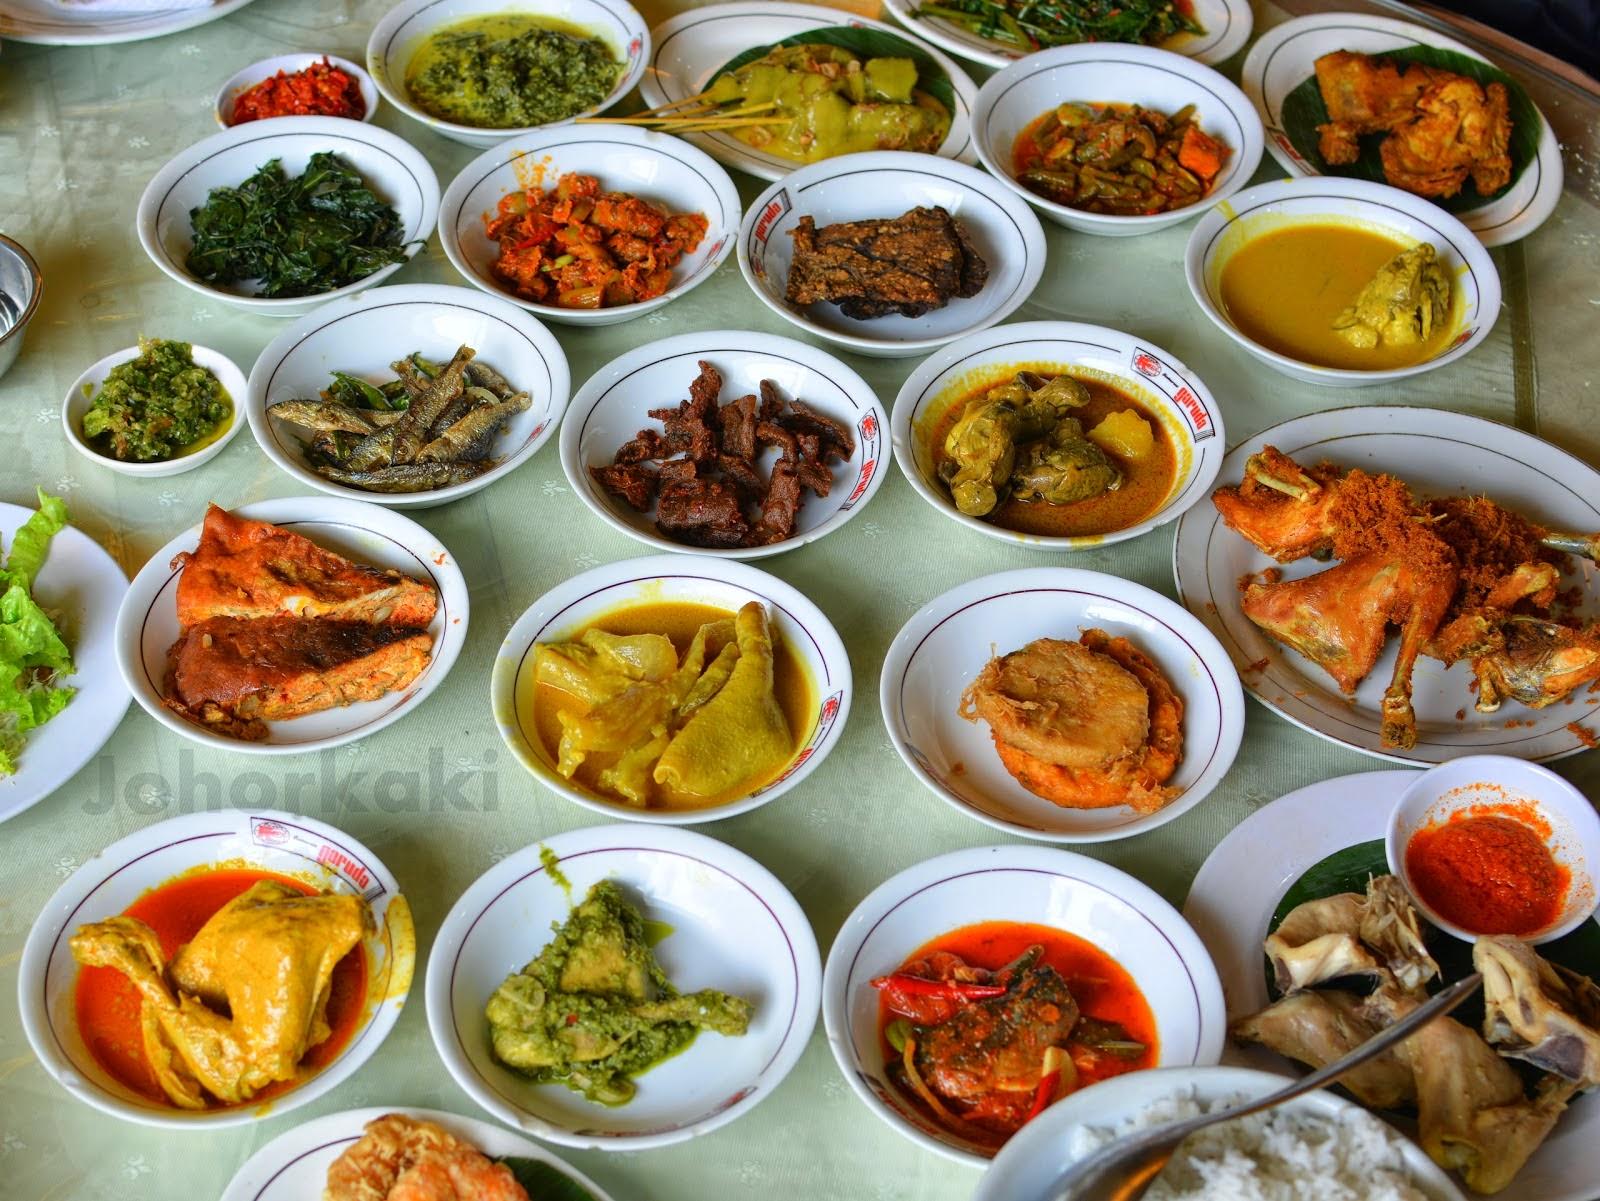 Padang Food Recipes